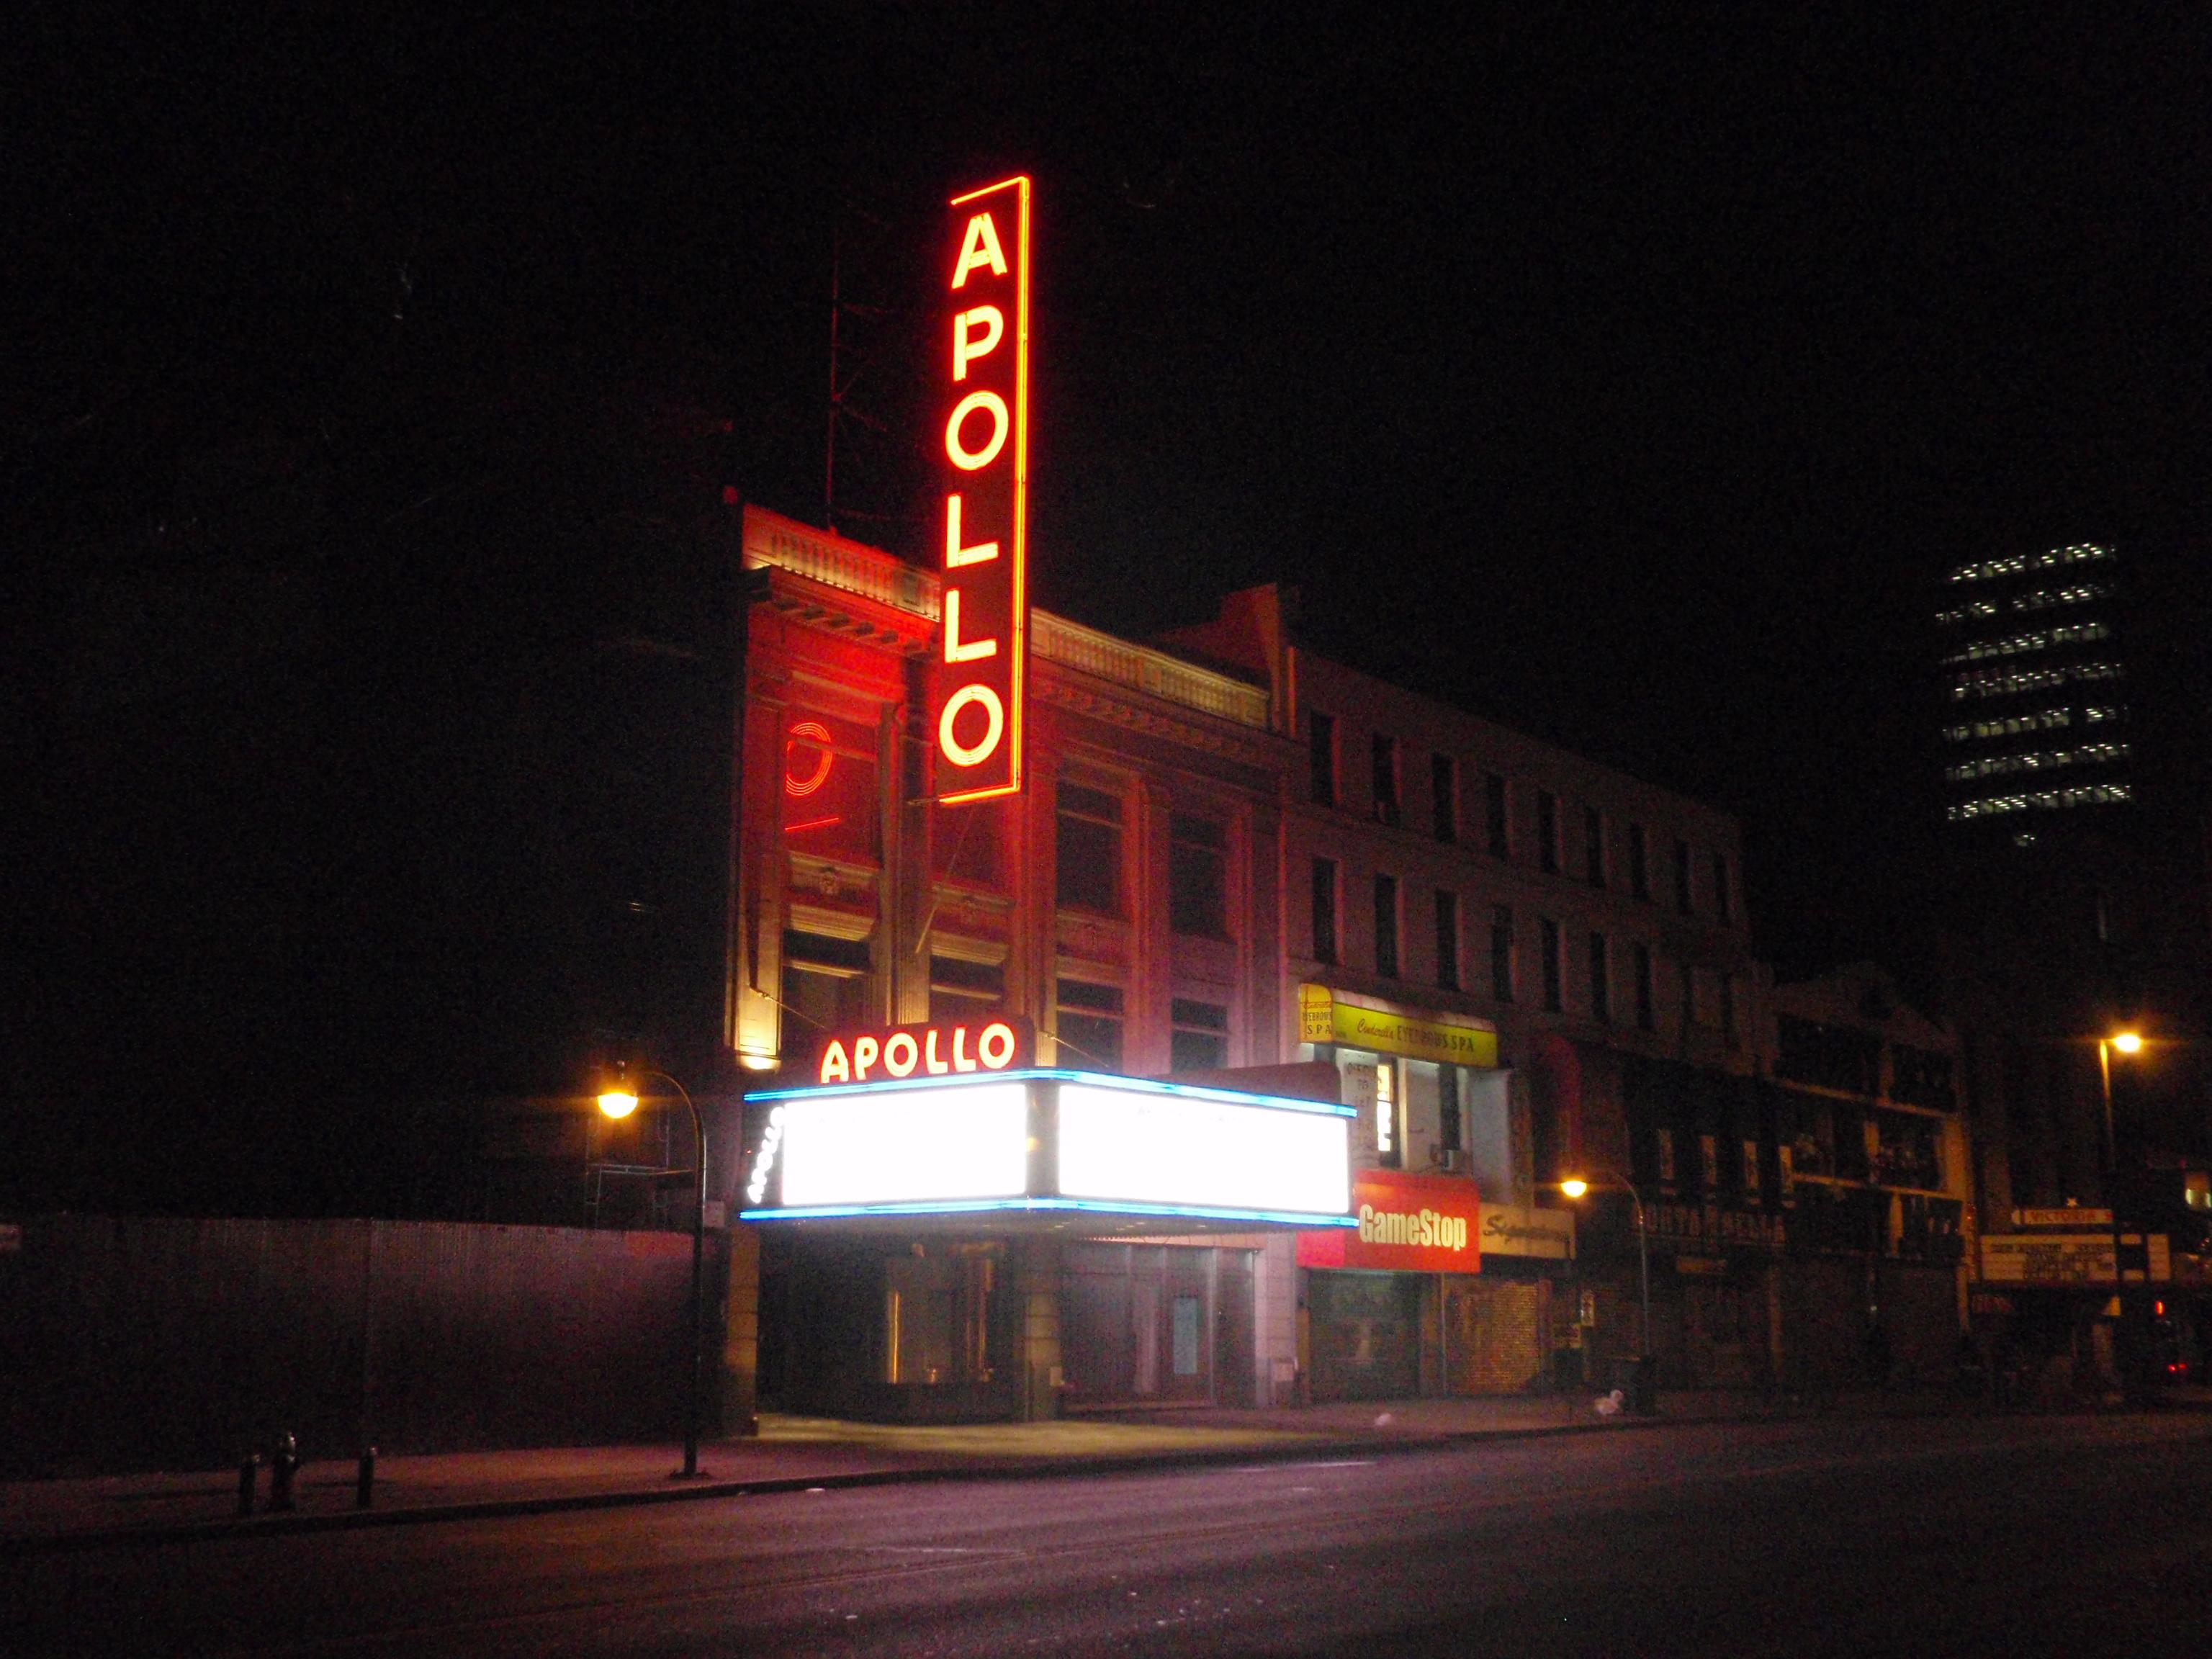 The Apollo in Harlem